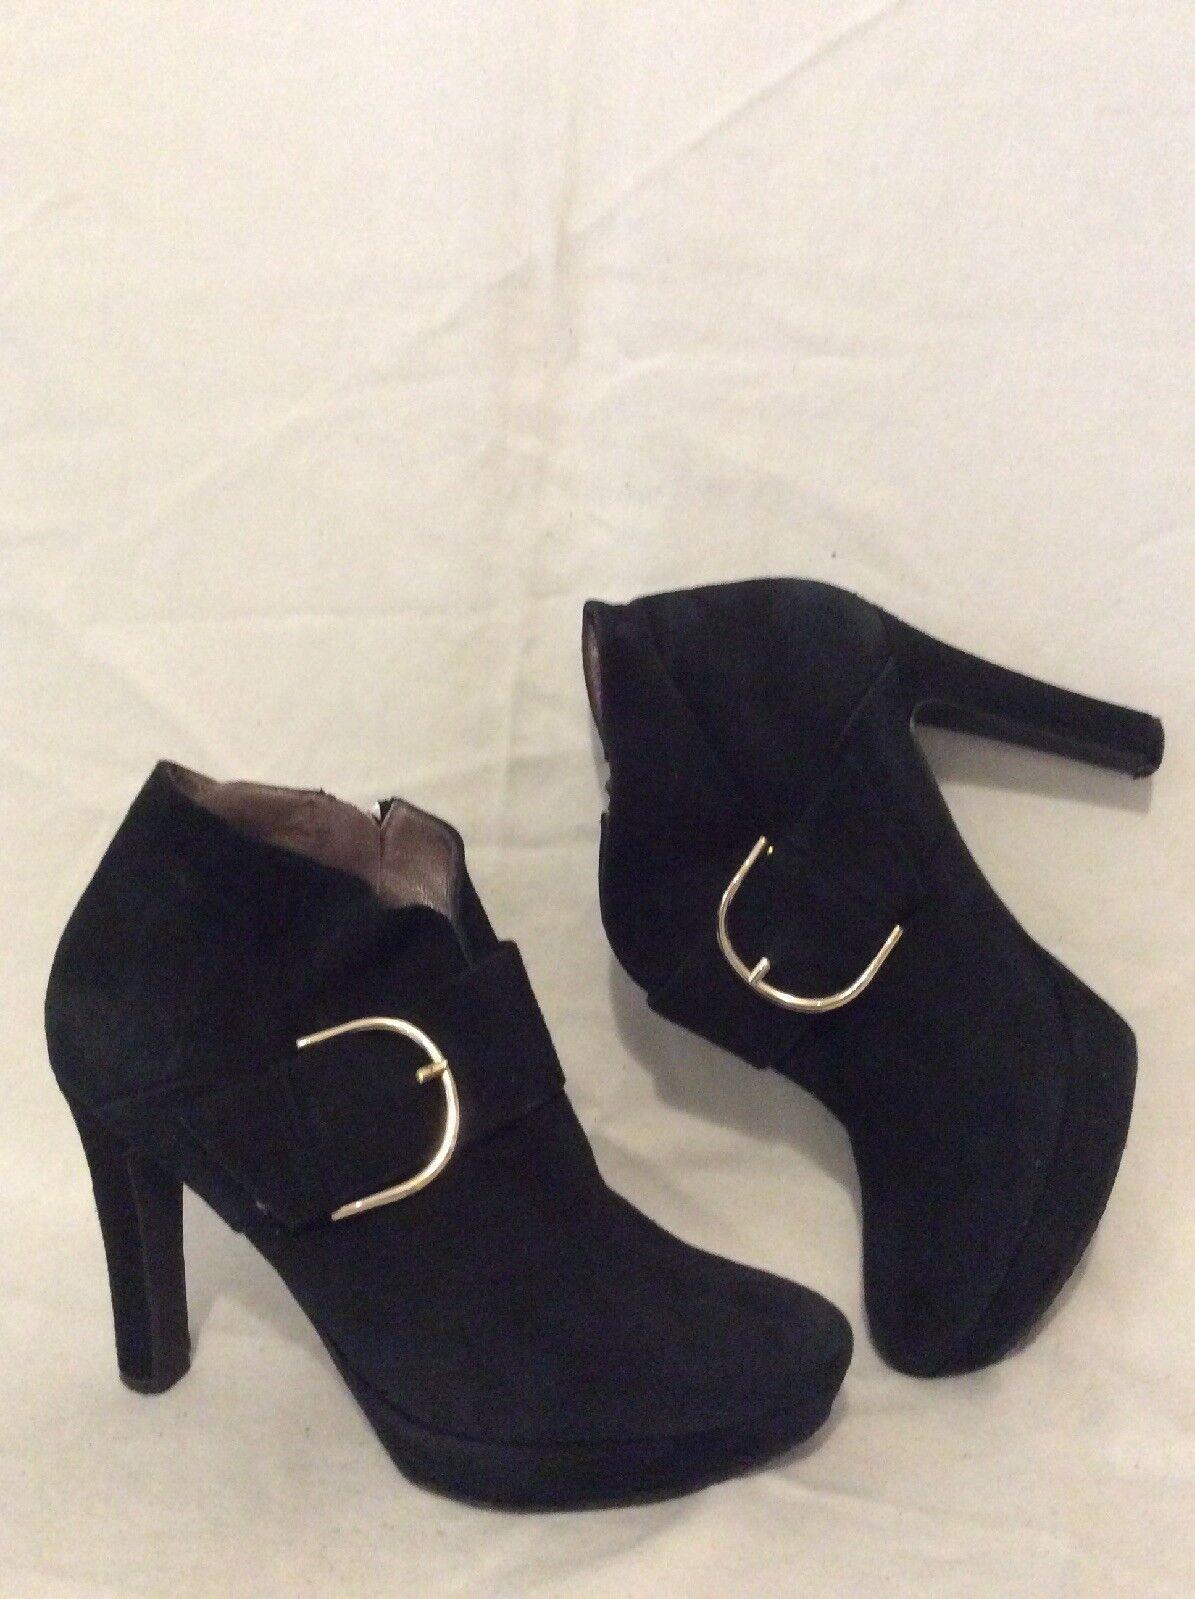 Daniel Black Ankle Suede Boots Size 40